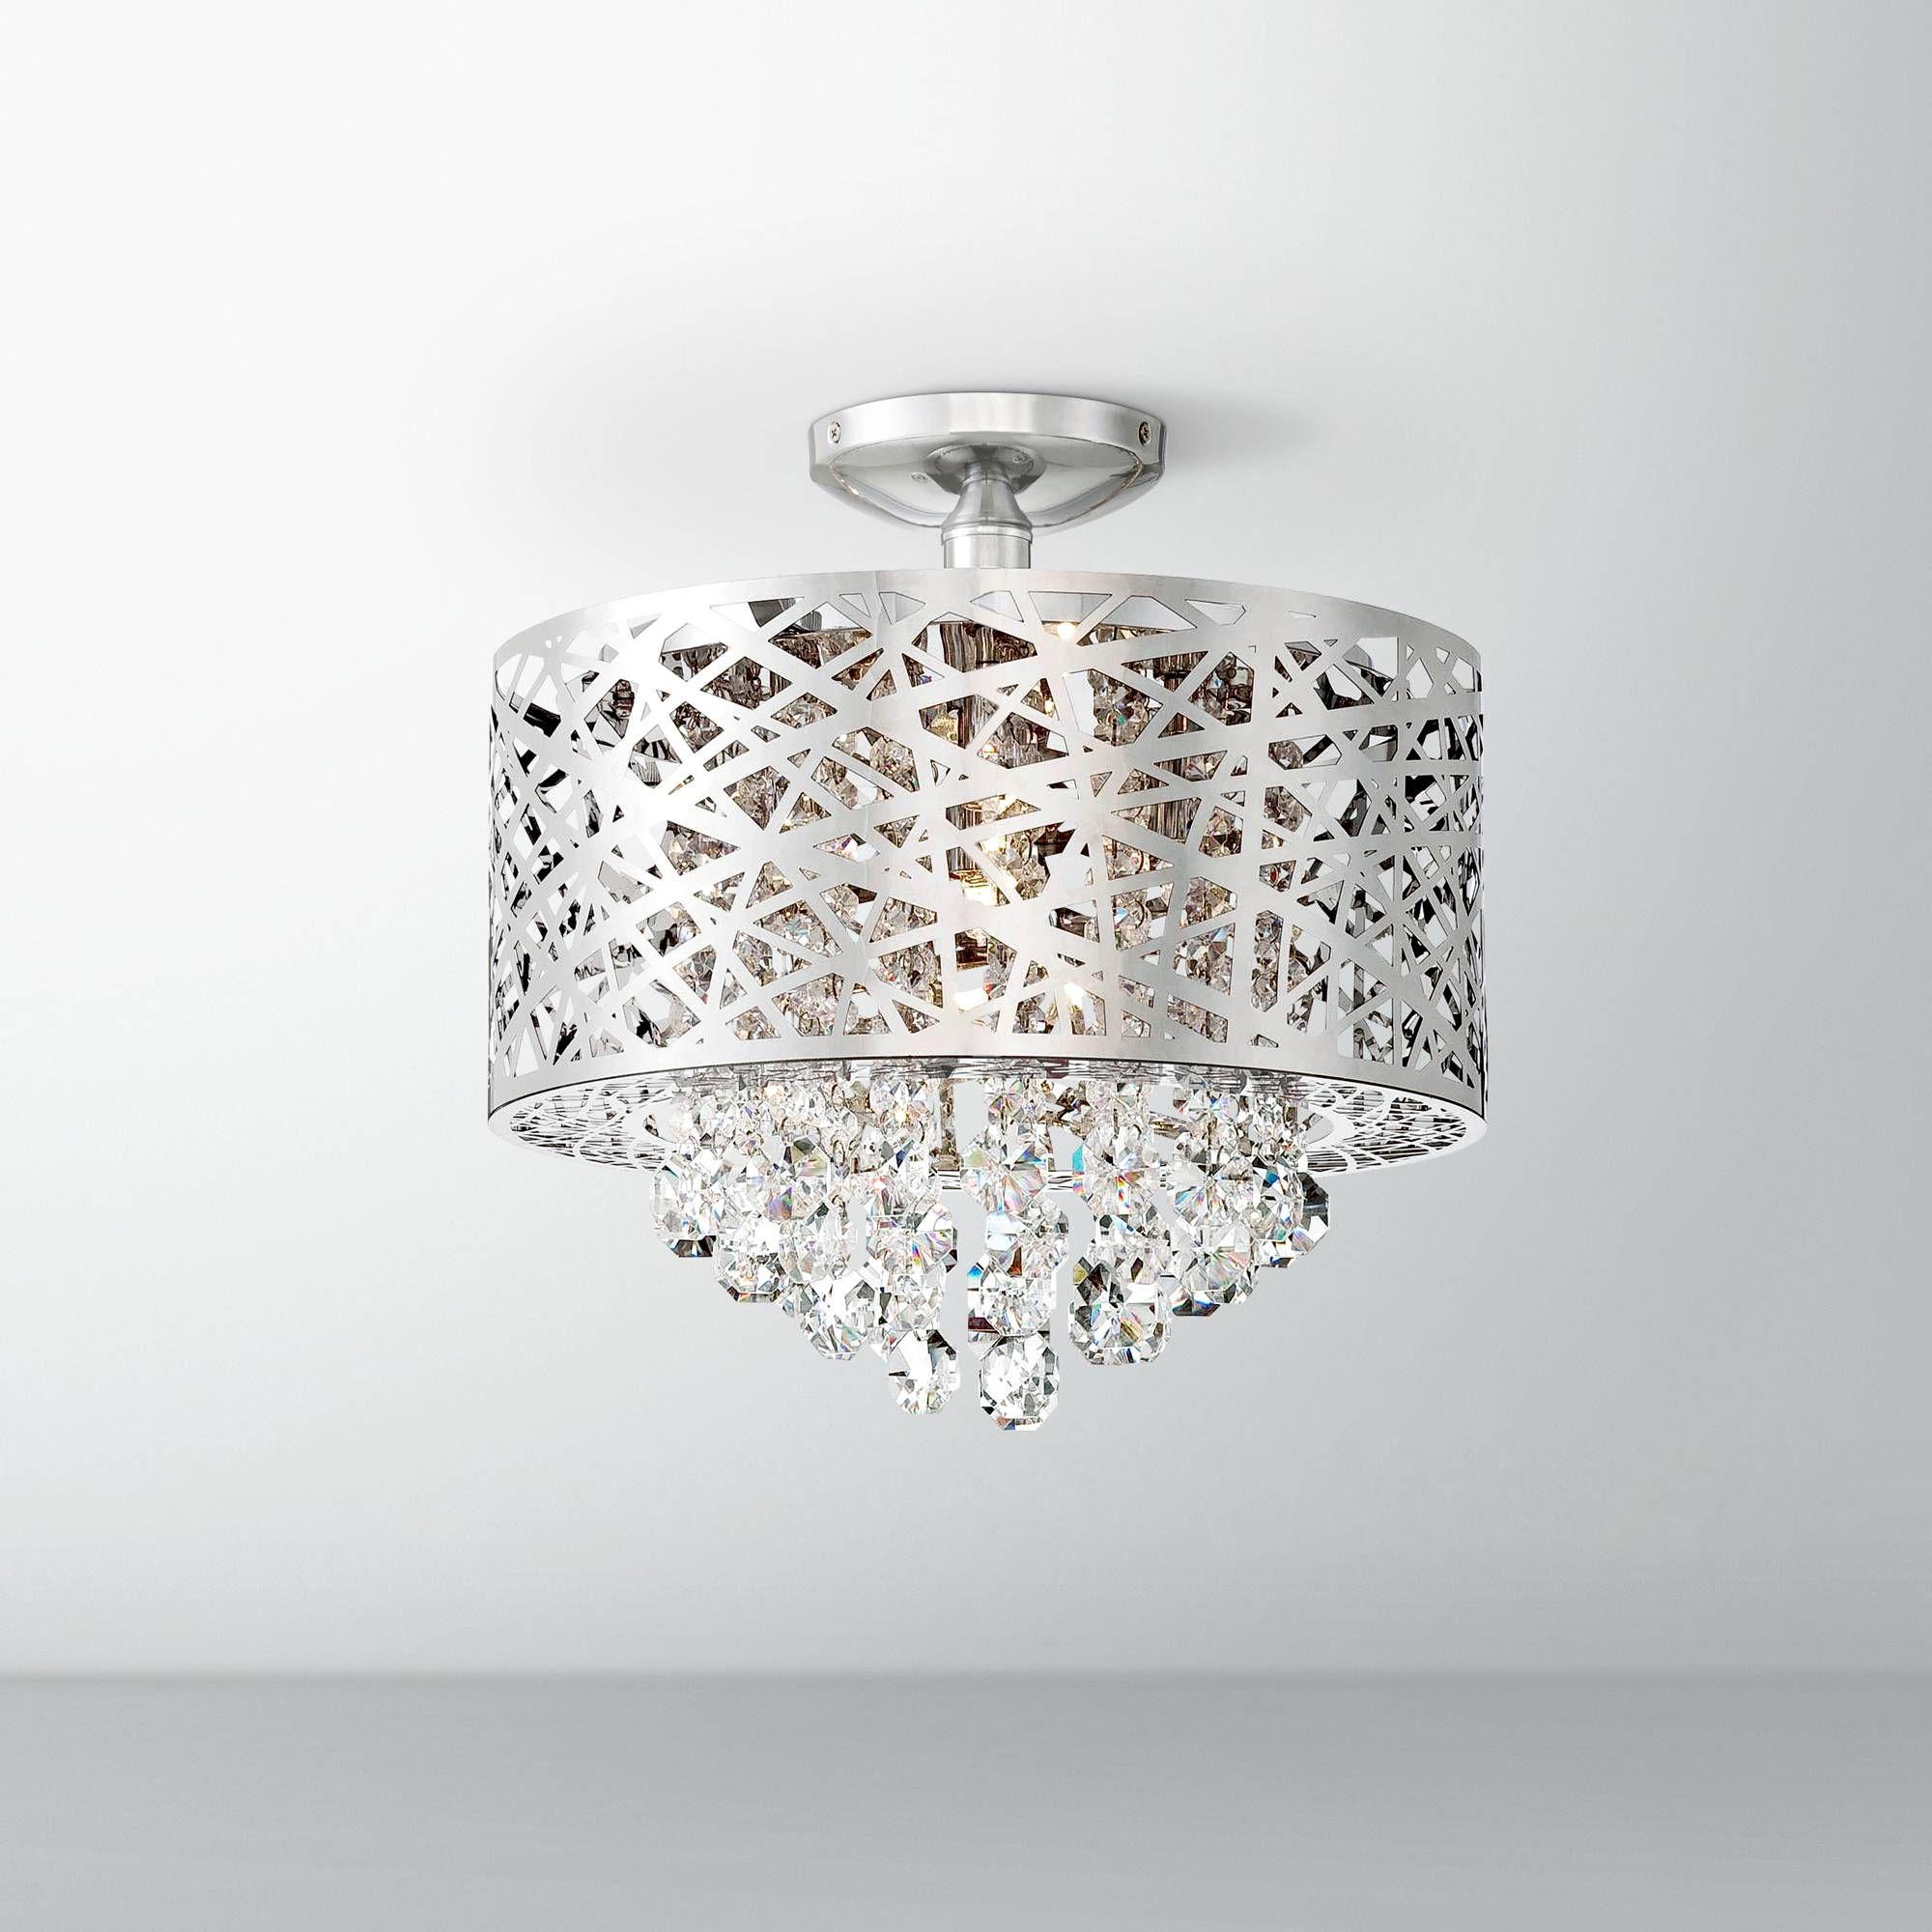 "Lite Source Benedetta 14"" Wide Cut Crystal Ceiling Light - #7J817 | Lamps Plus"